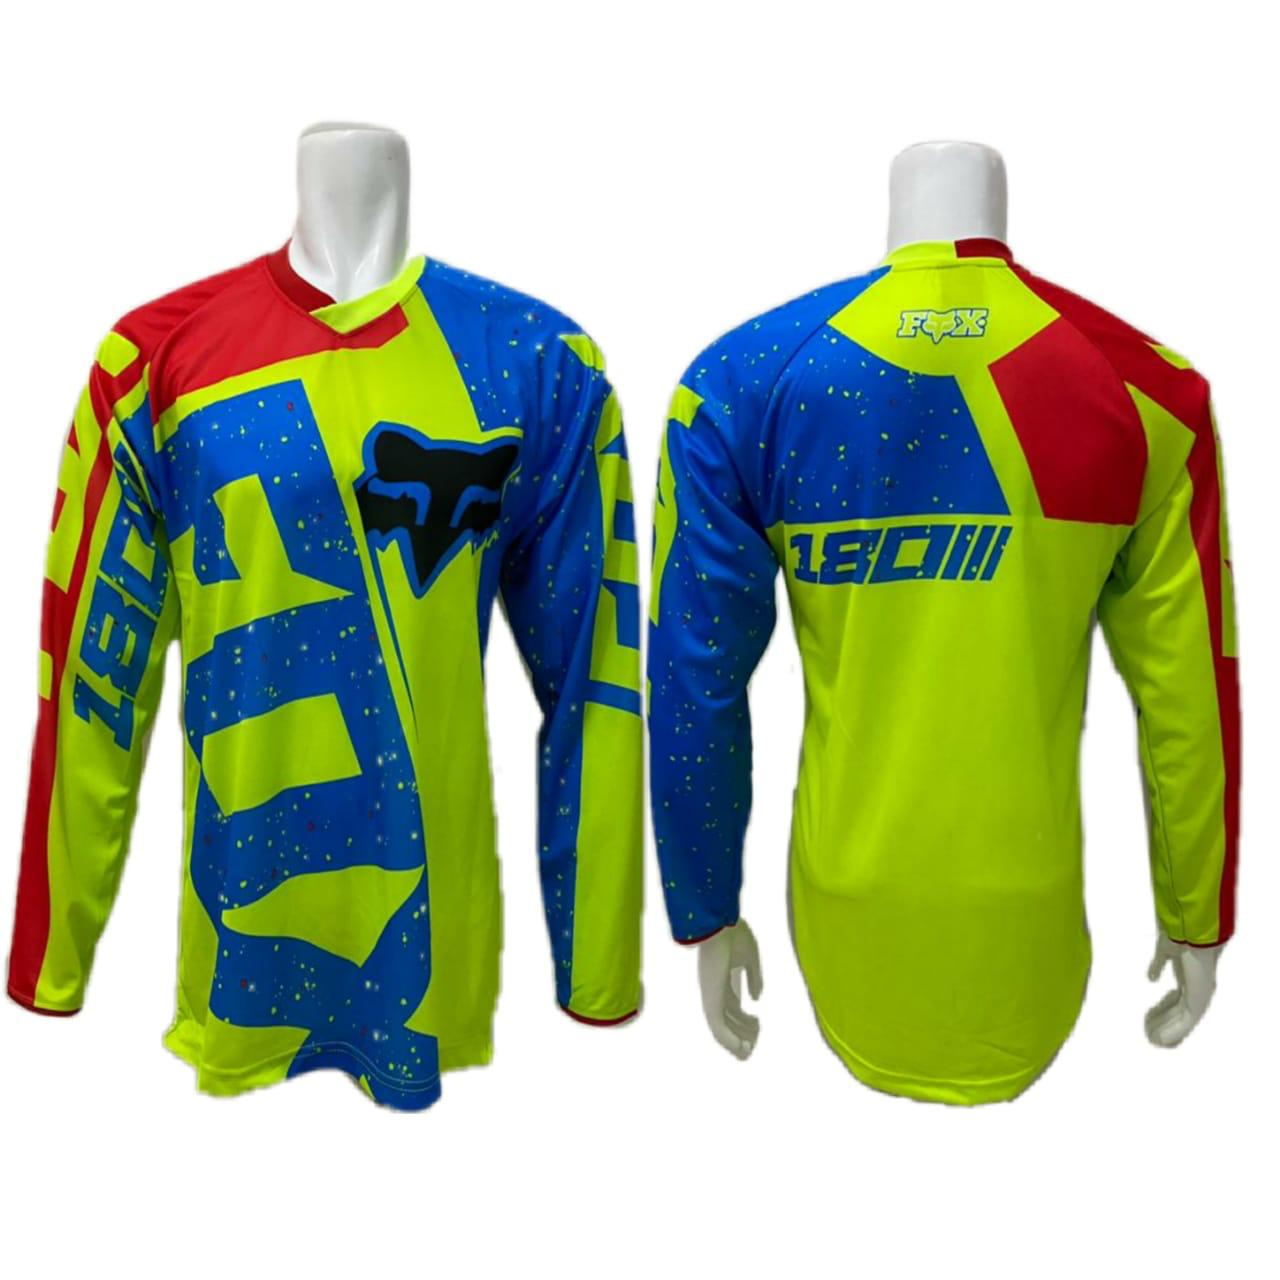 baju jersey sepeda cross downhill js lengan panjang/baju sepeda mtb dewasa